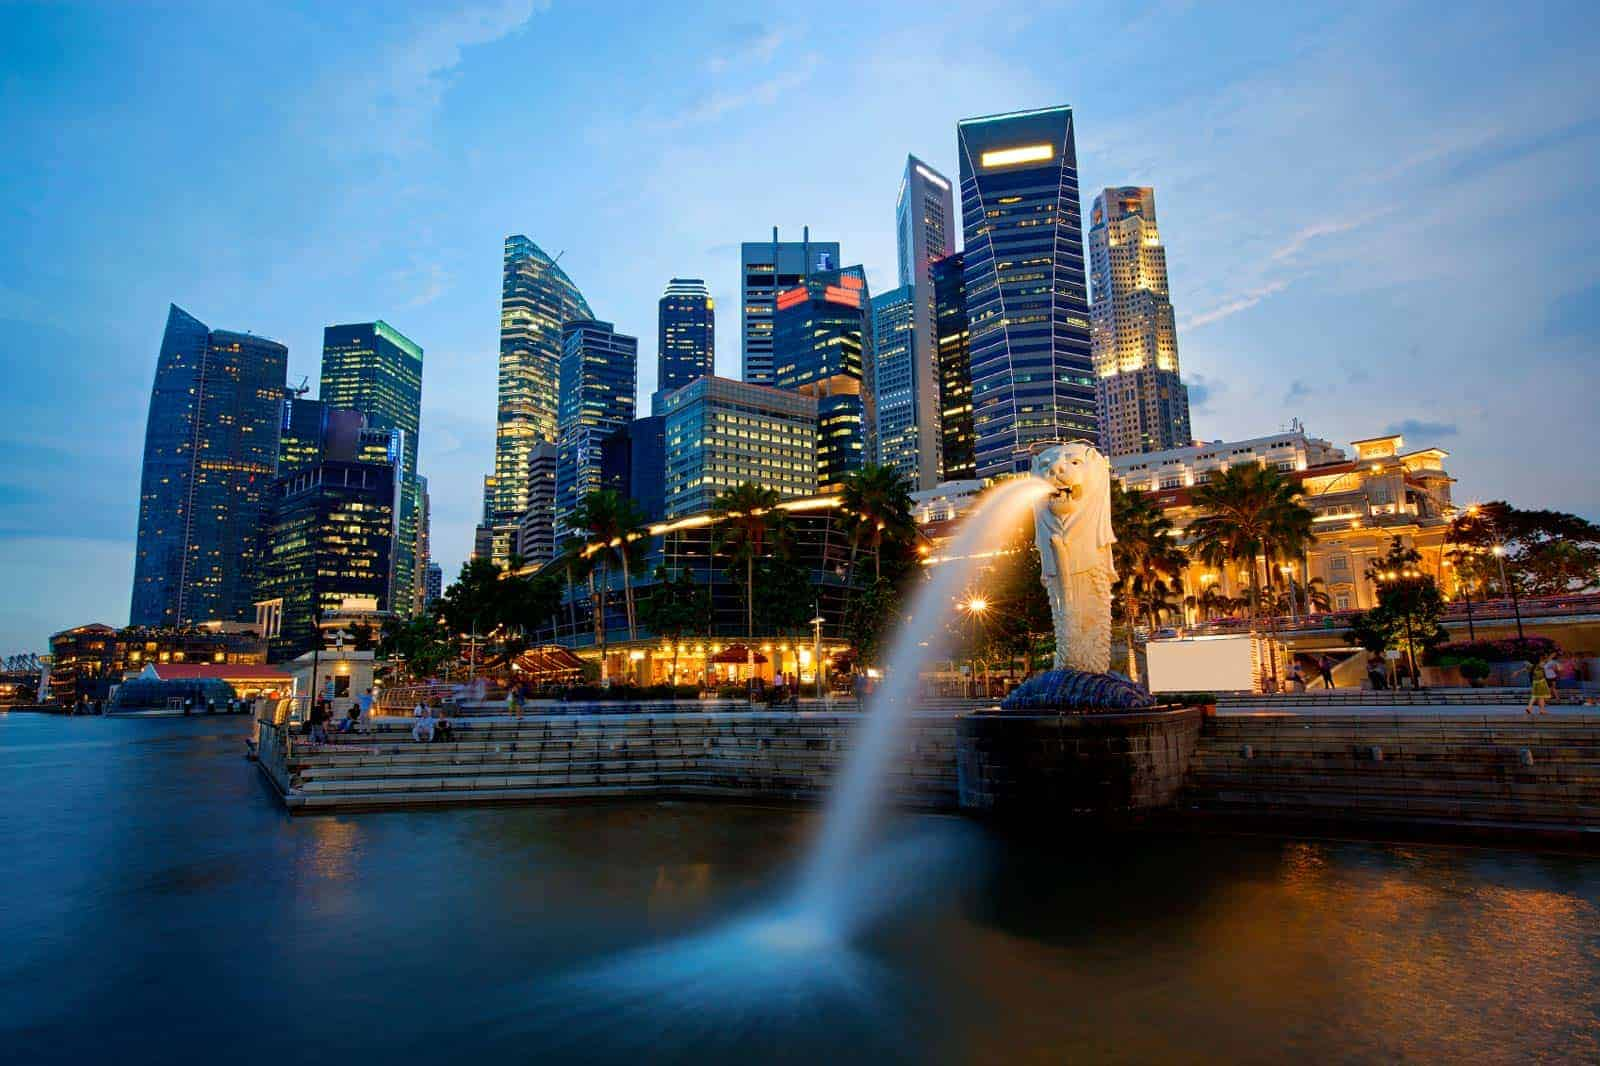 Skyline de Singapura